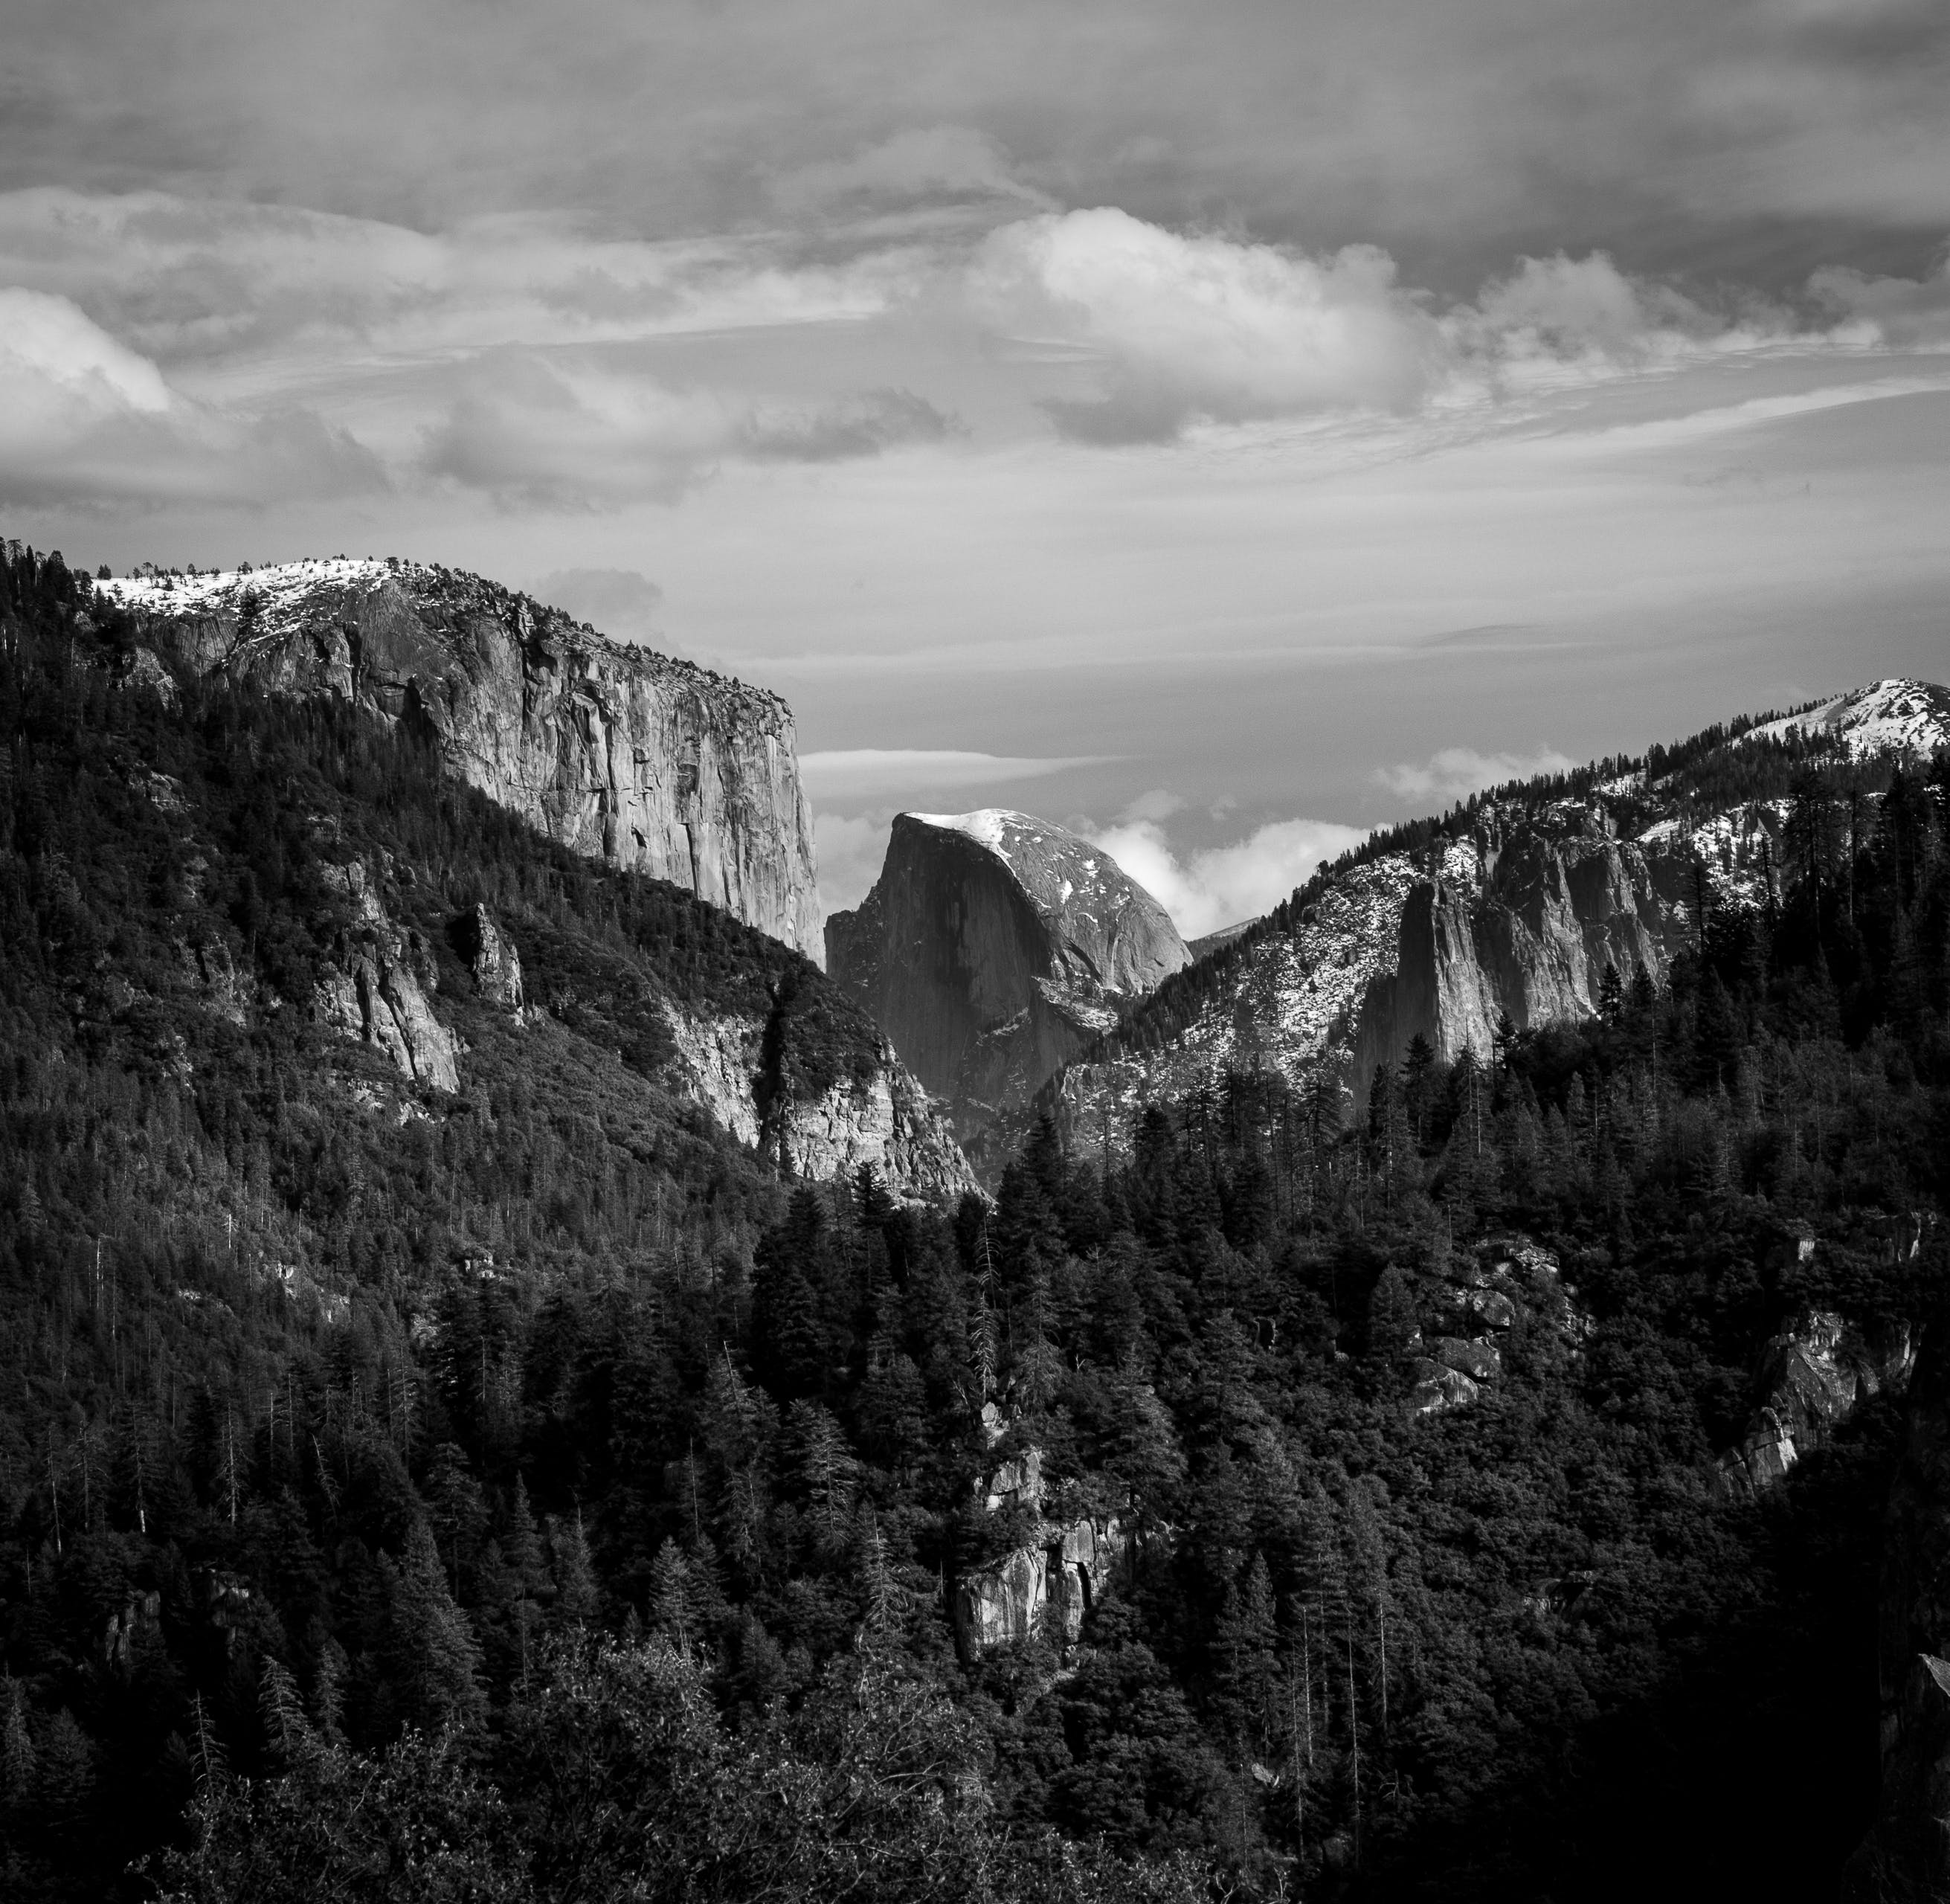 Free stock photo of black and white, el capitan, half dome, hiking